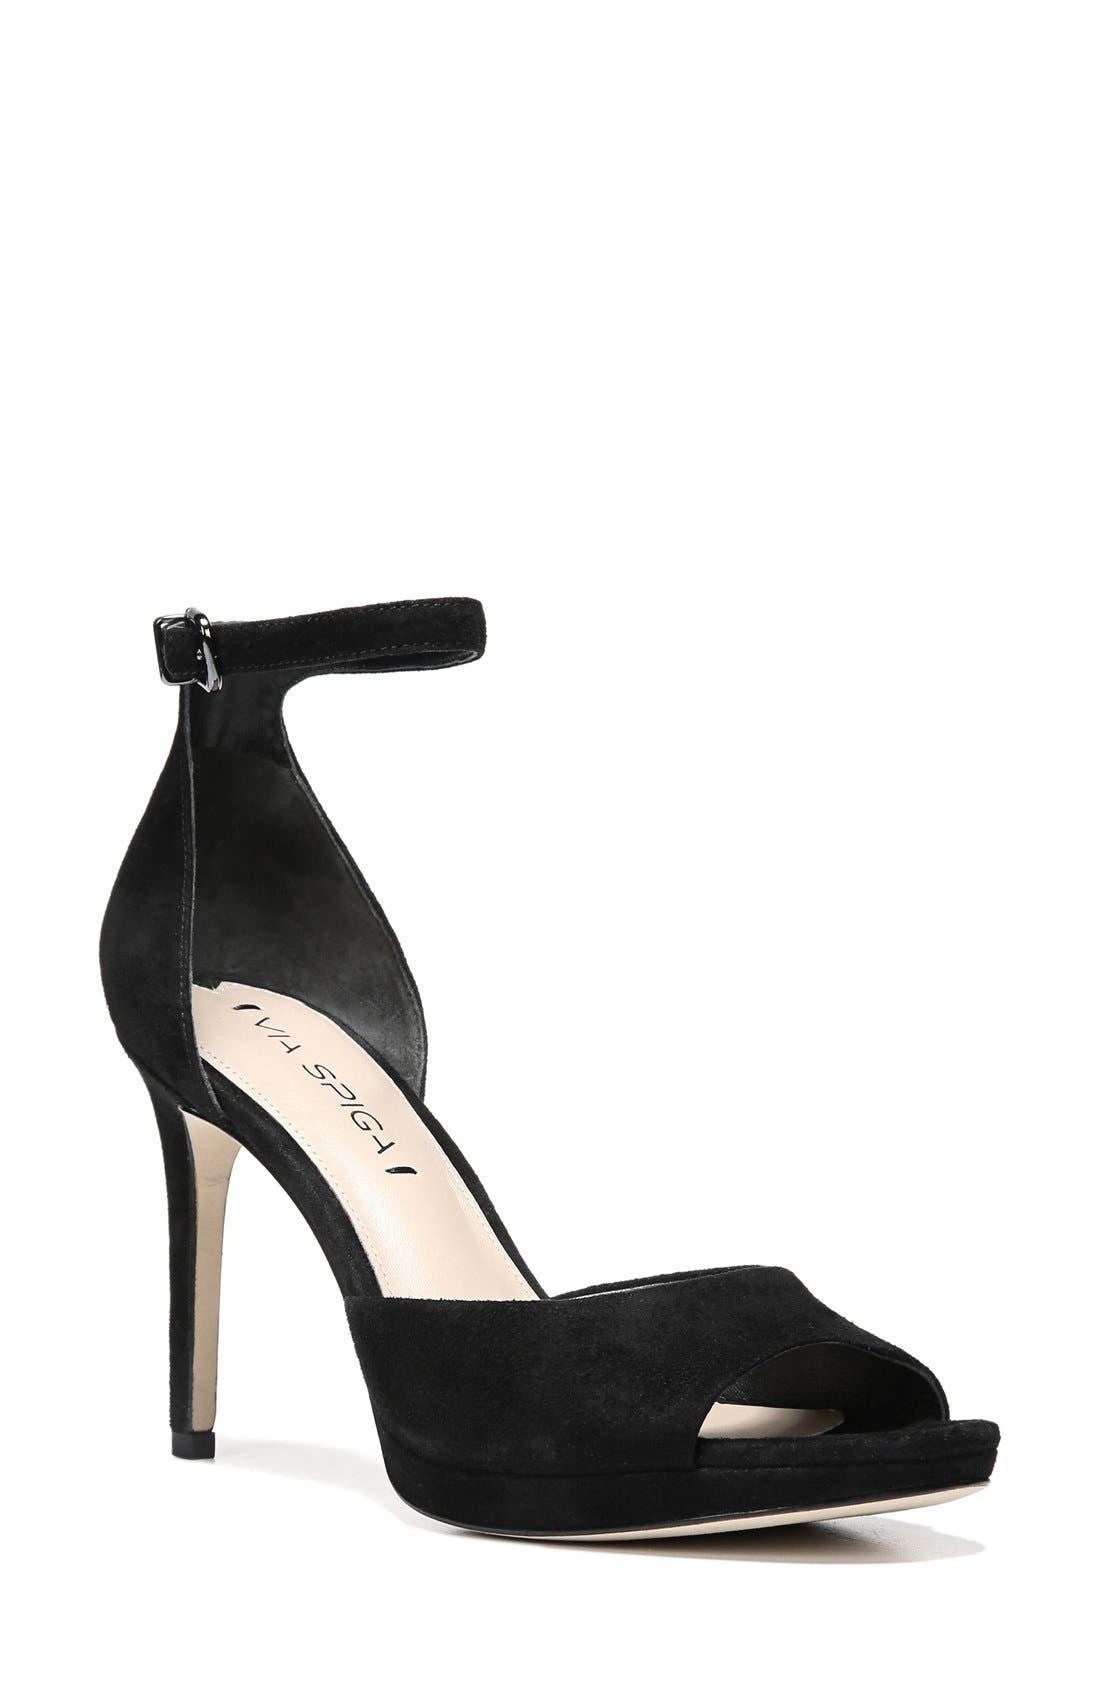 Alternate Image 1 Selected - Via Spiga 'Salina' Sandal (Women)